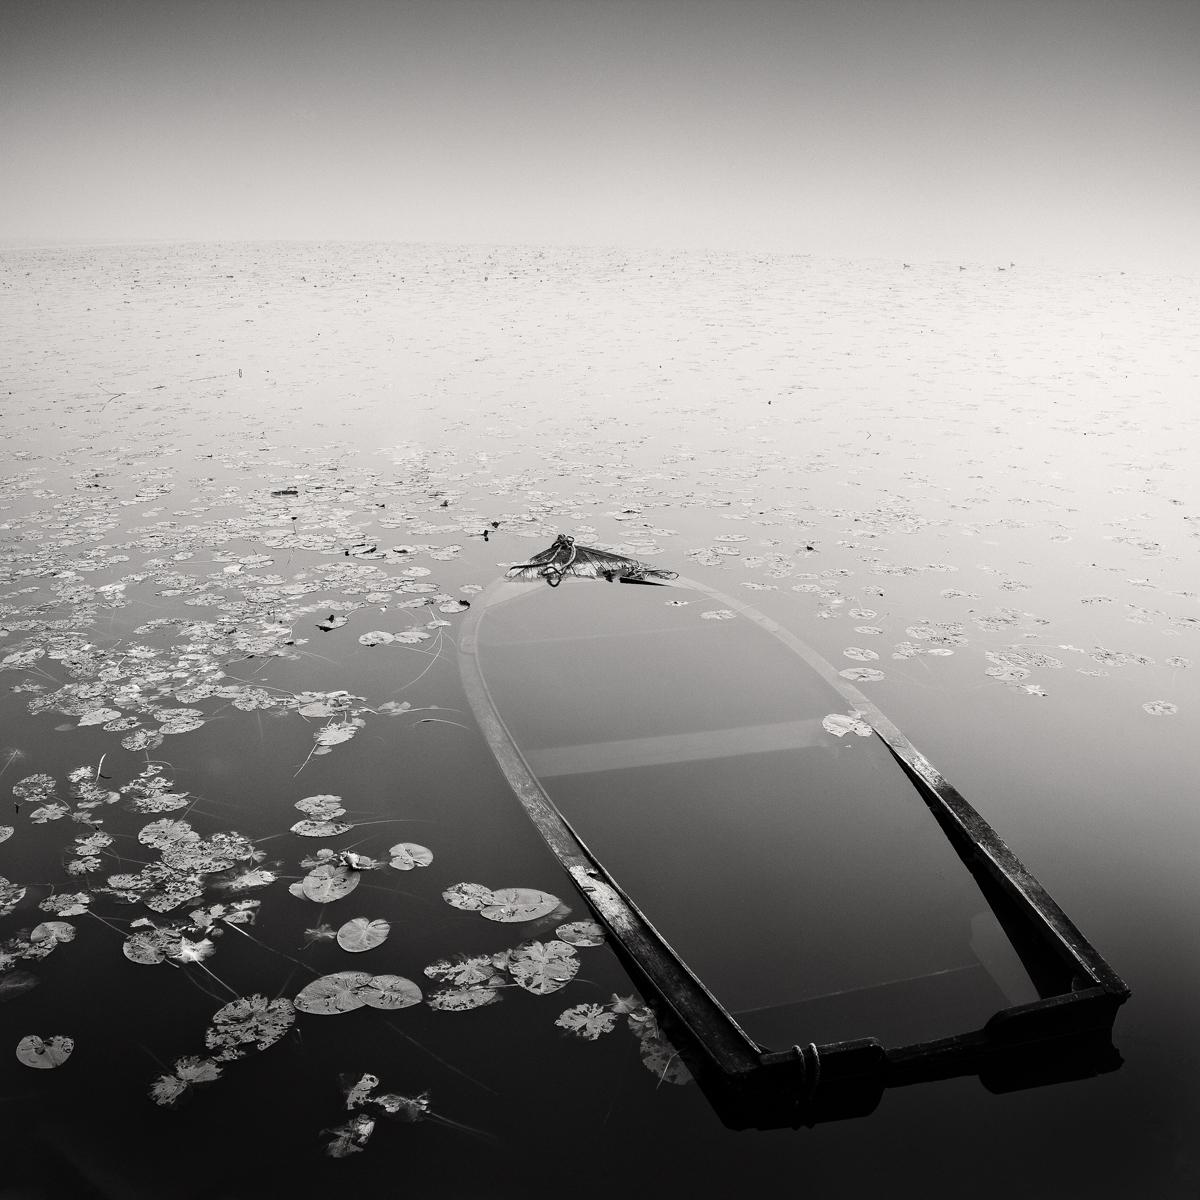 FrangDushaj_OneiricLake_Submerged.jpg